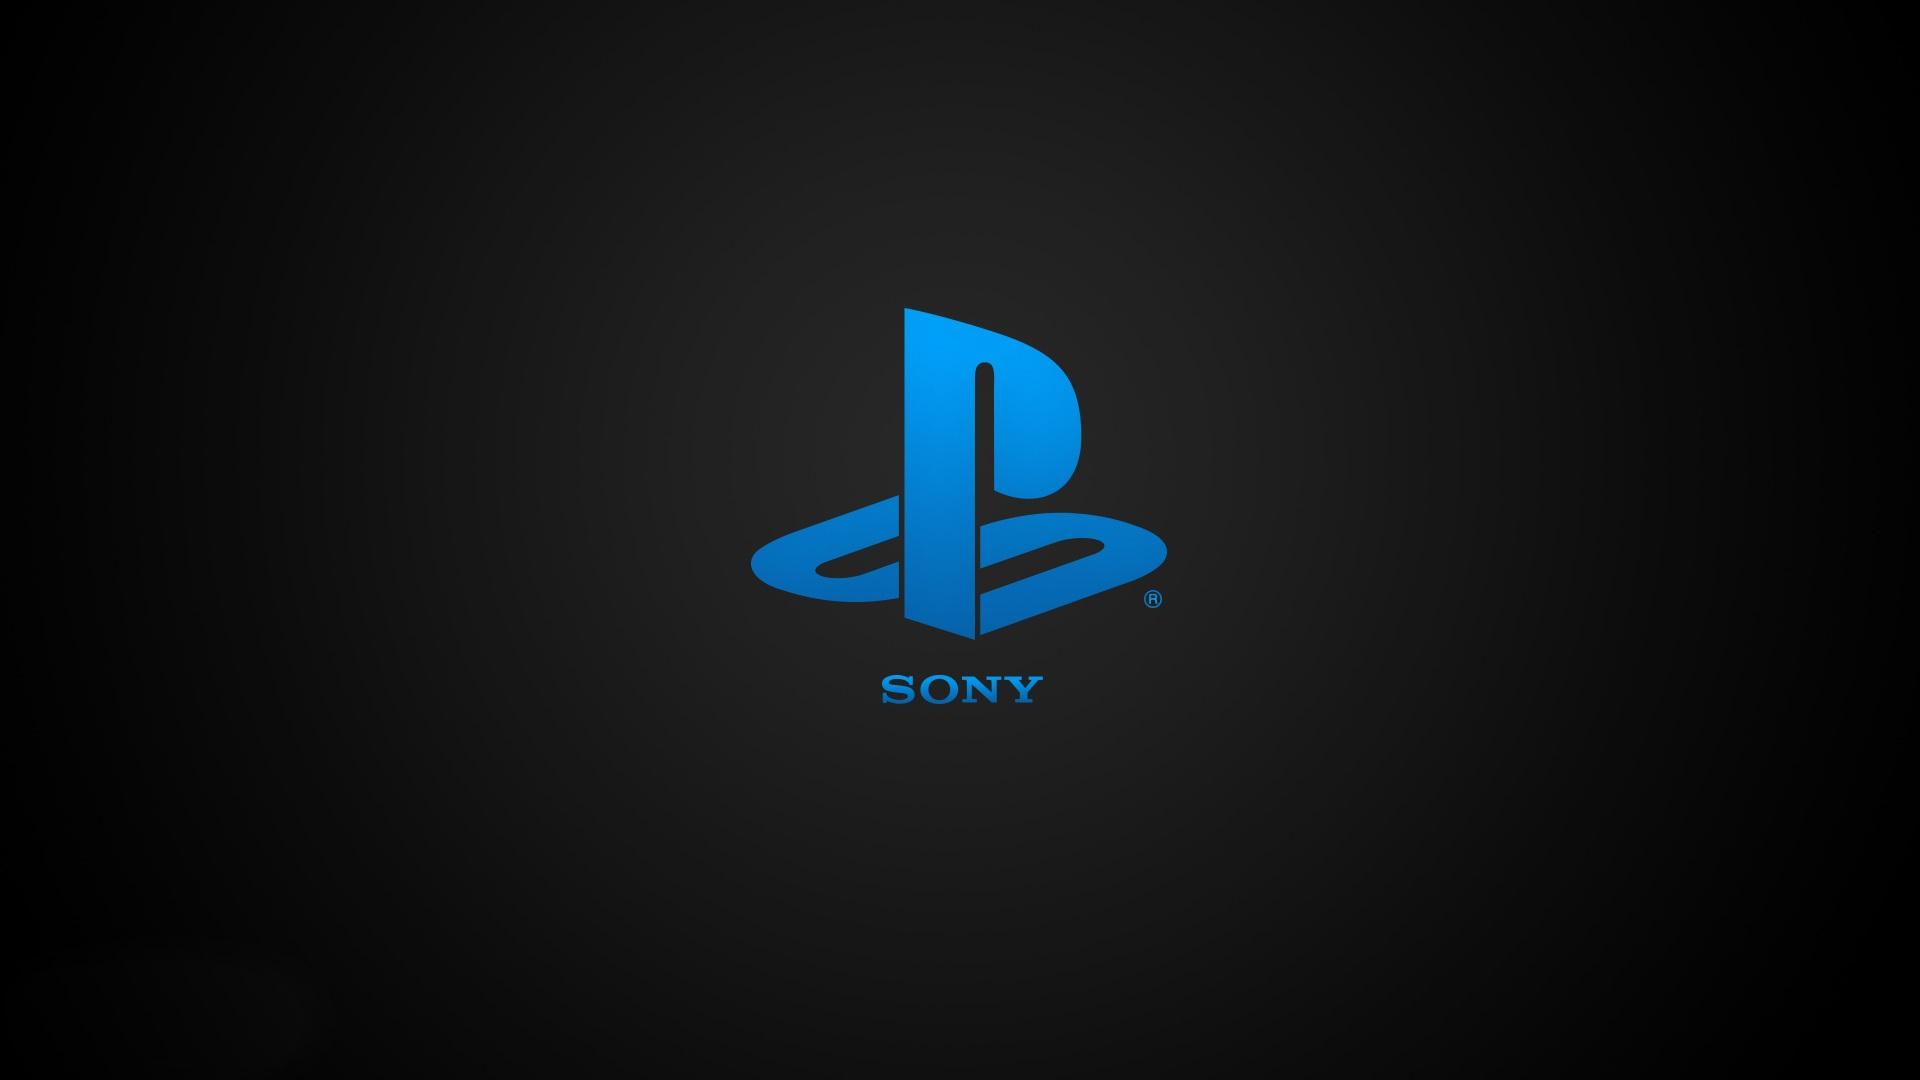 Wallpaper download in full hd - Sony Playstation Blaues Logo Hintergrundbilder 1920x1080